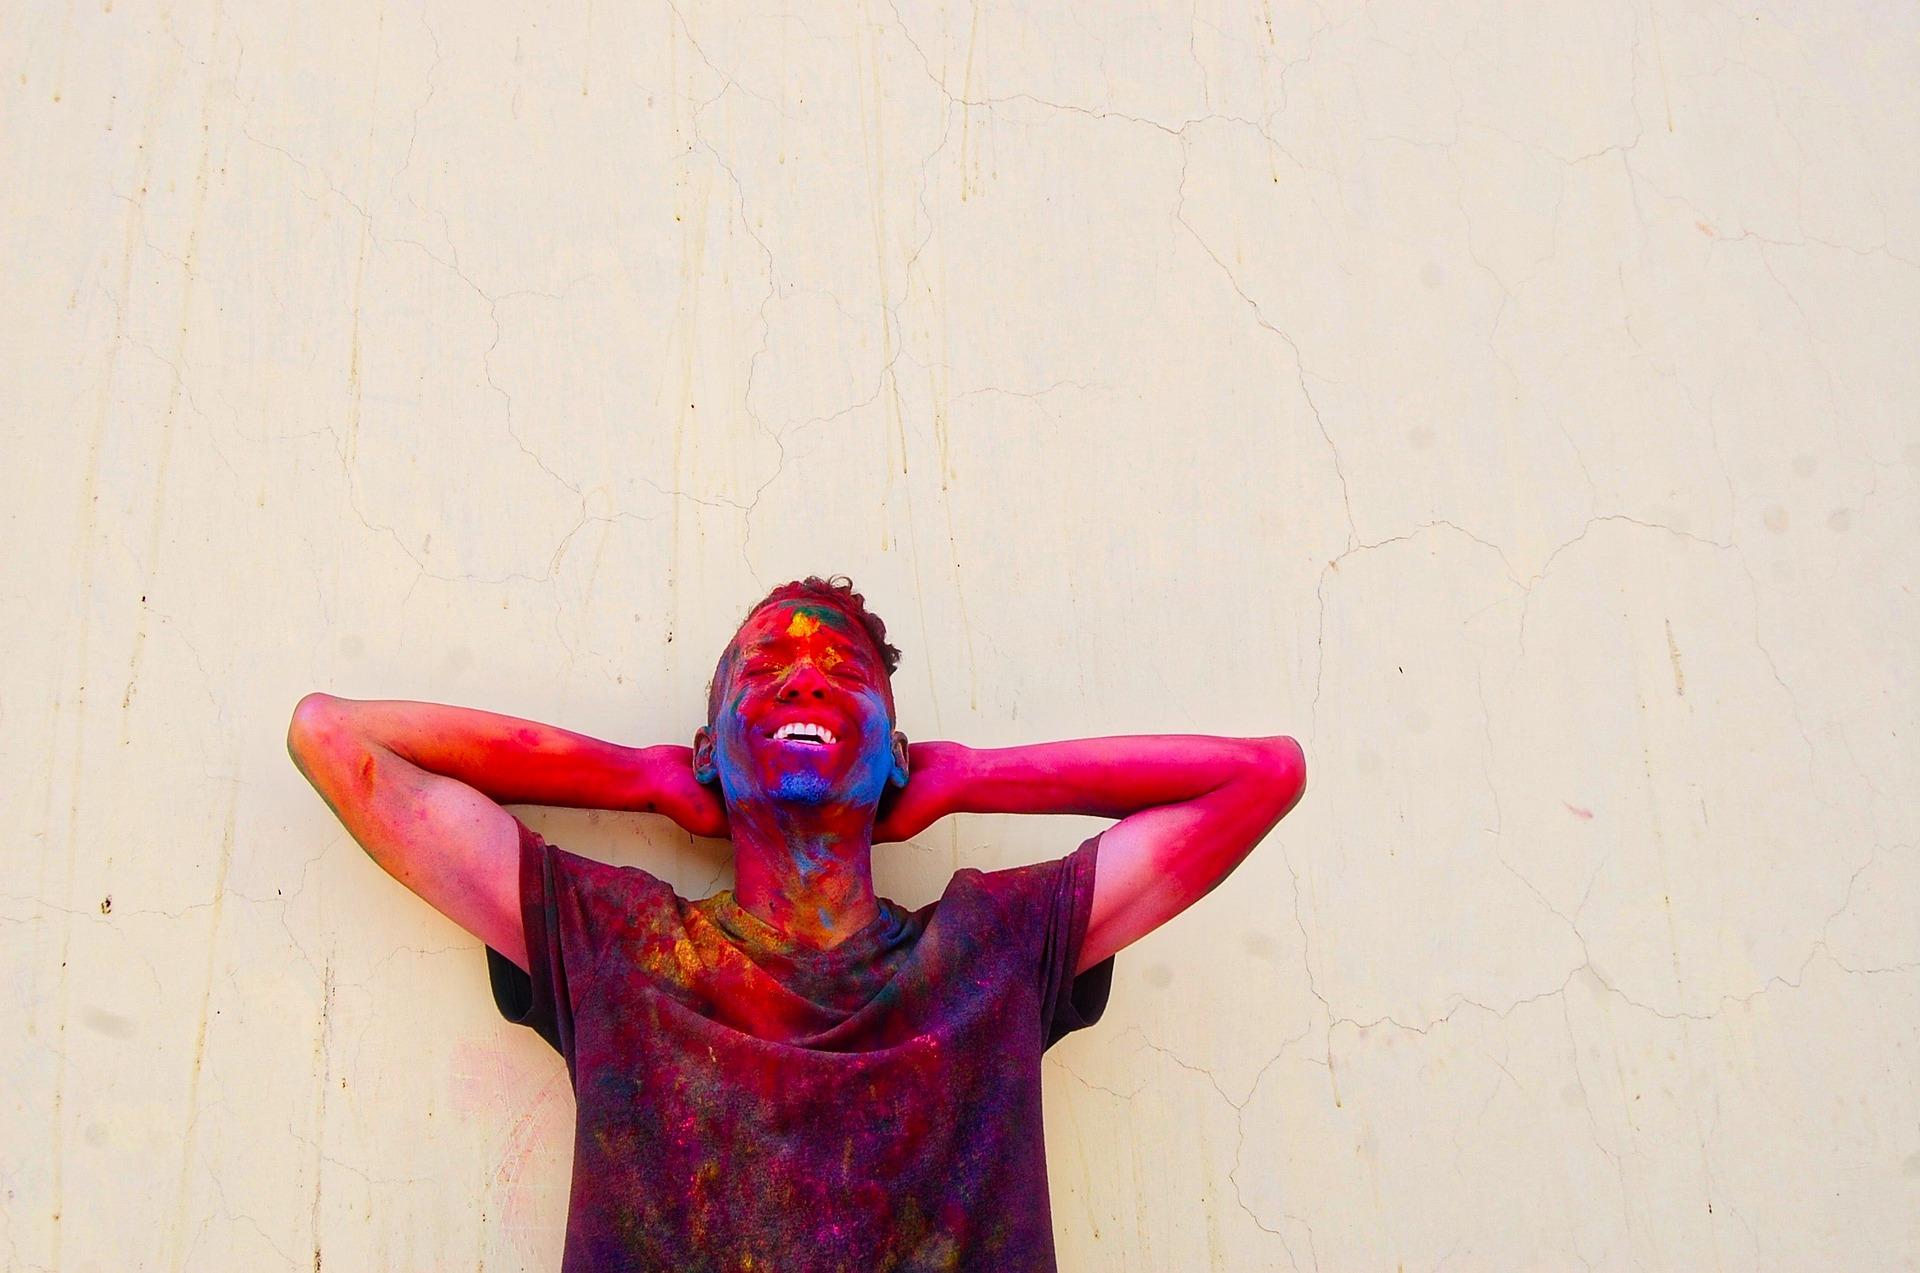 Halucinace - LSD - trip